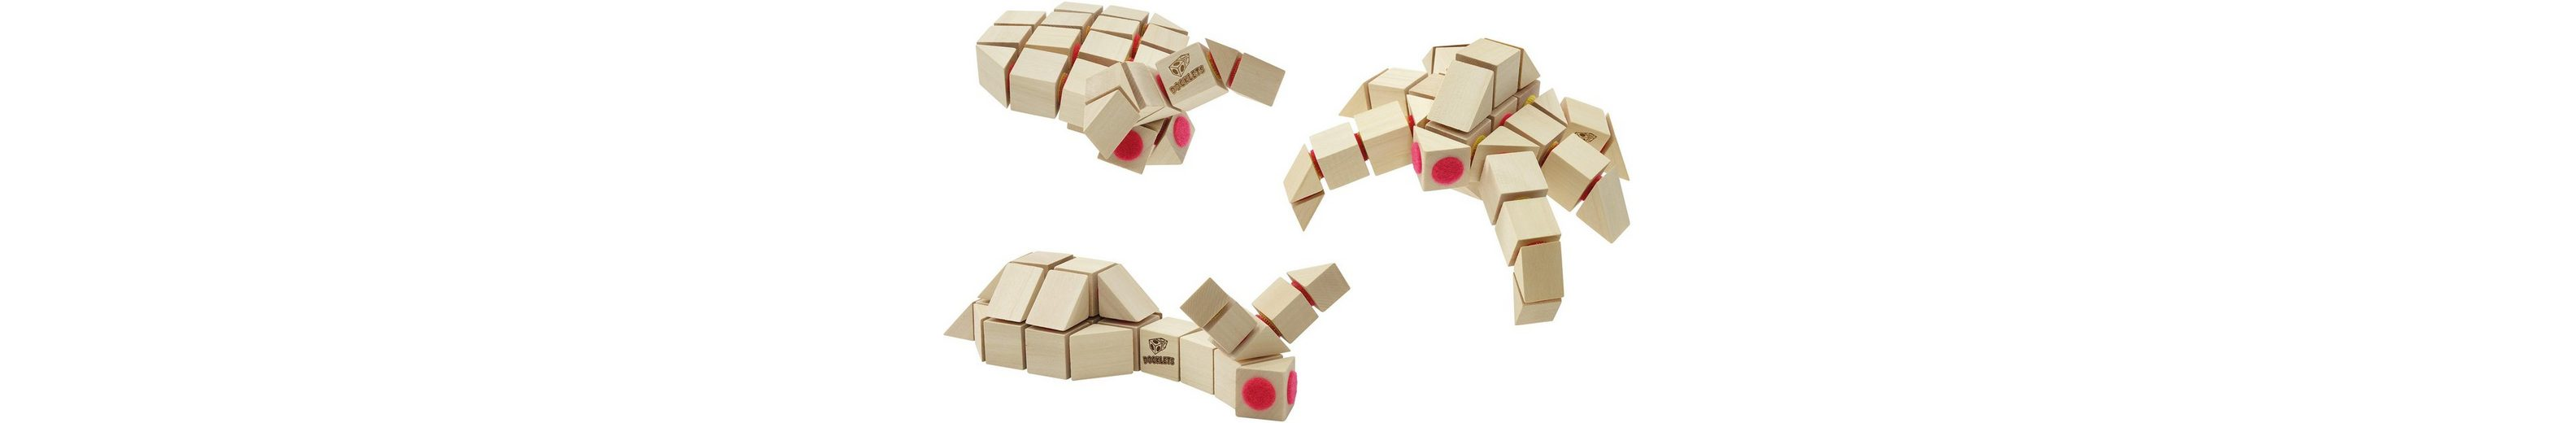 Holzbausteine mit Klettverbindung, »DOCKLETS® Creepy Crawlies Set«